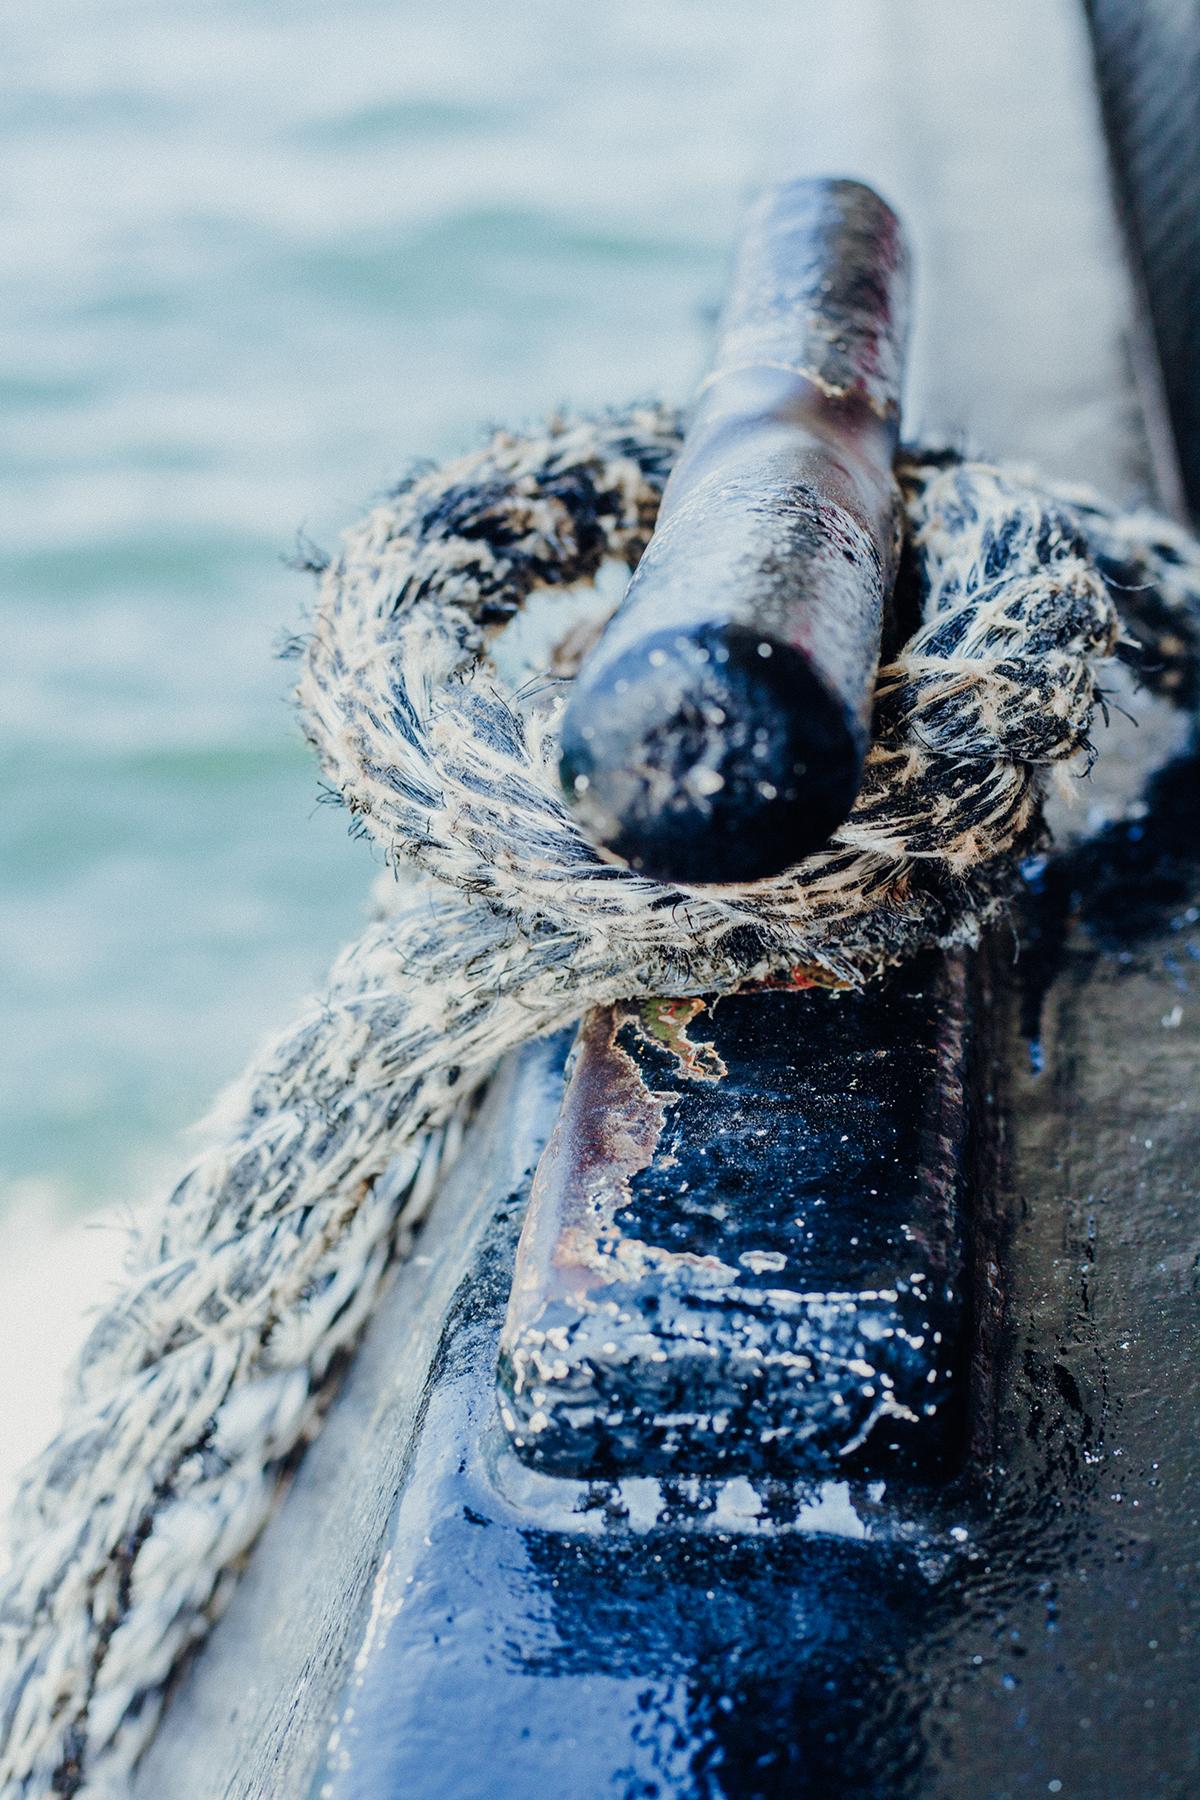 Kiel mit der Förde Fähre entdecken